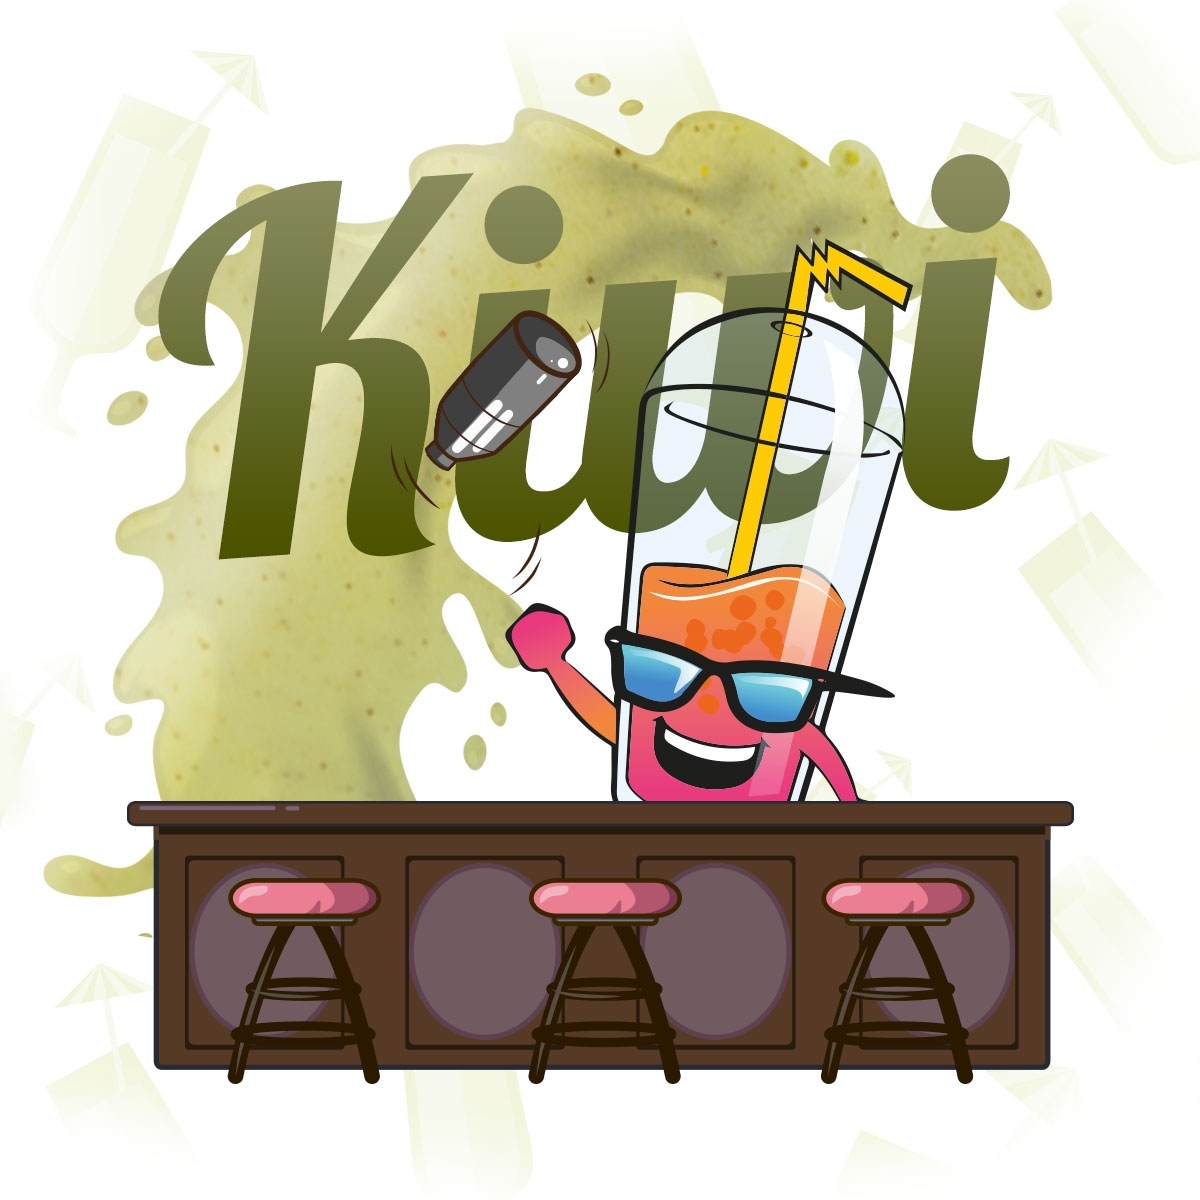 Kiwi Kick / Kiwi Peach